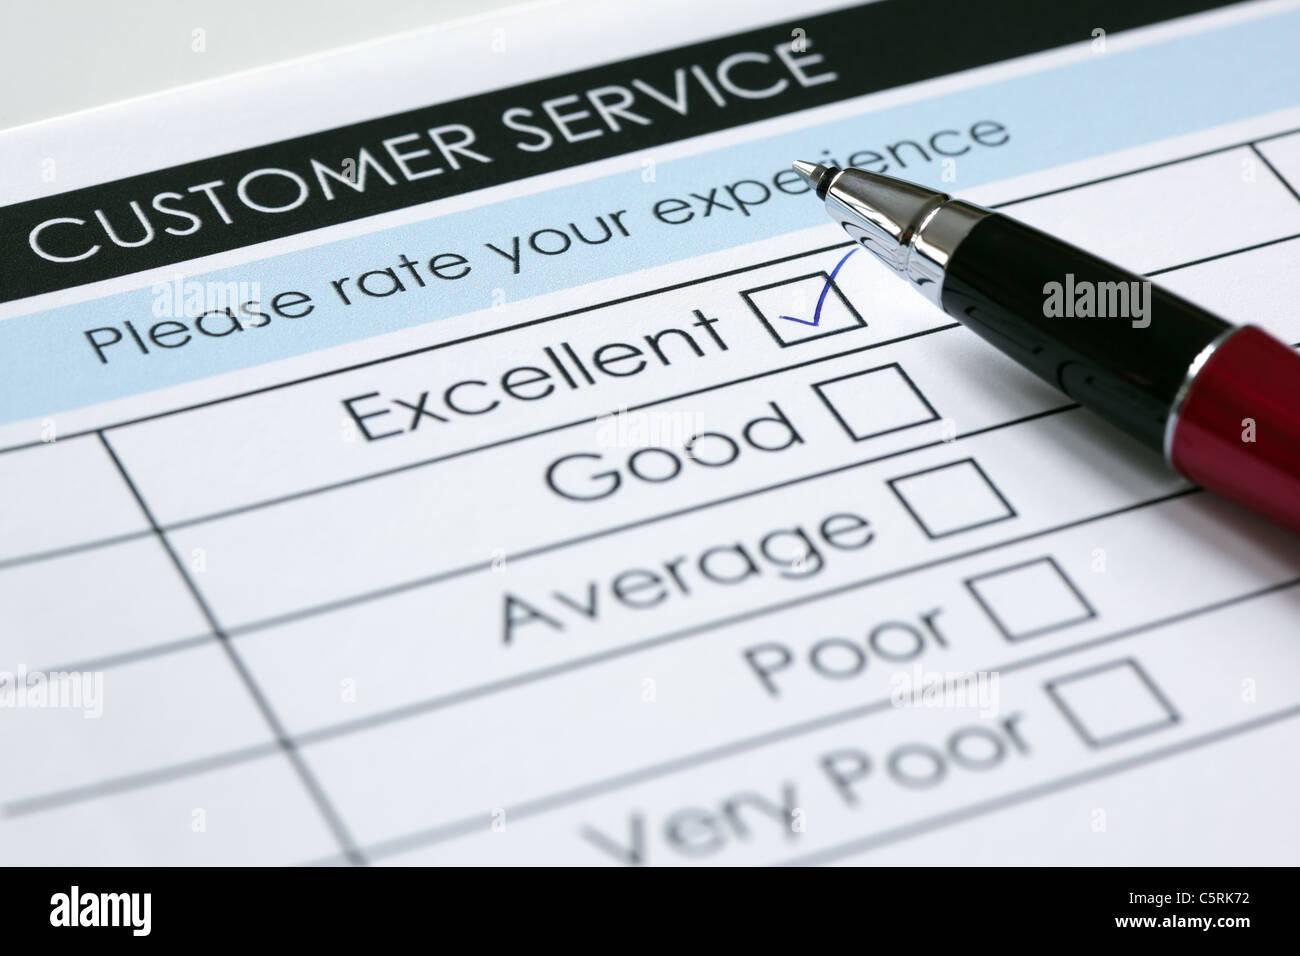 Customer service satisfaction survey - Stock Image